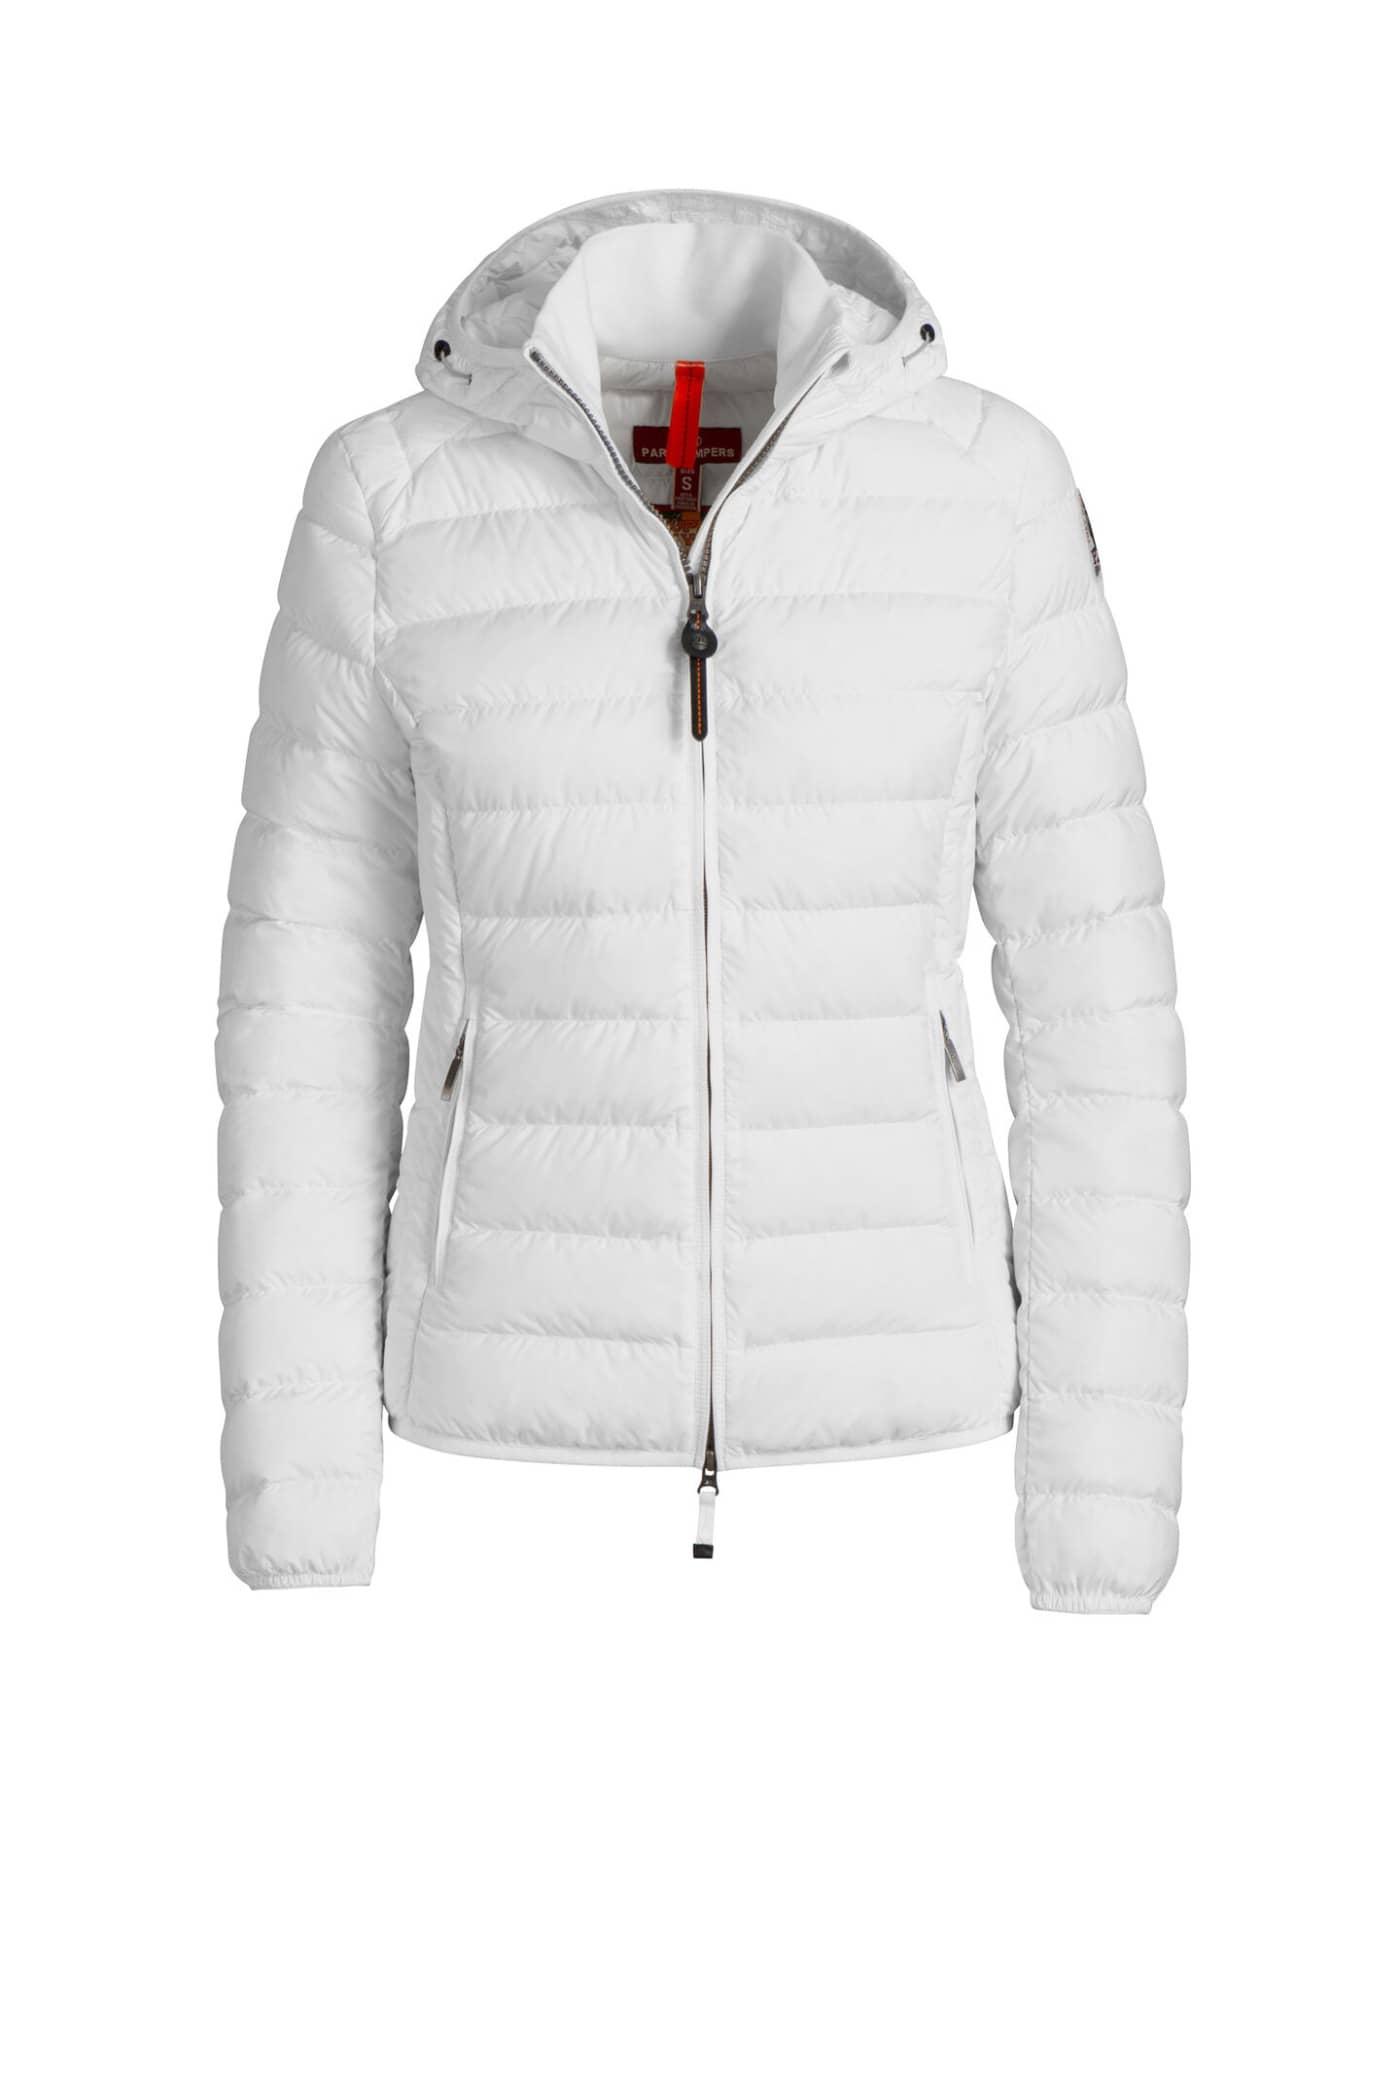 Hoodie, Sleeve, Jacket, Clothing, Hood, White, Outerwear